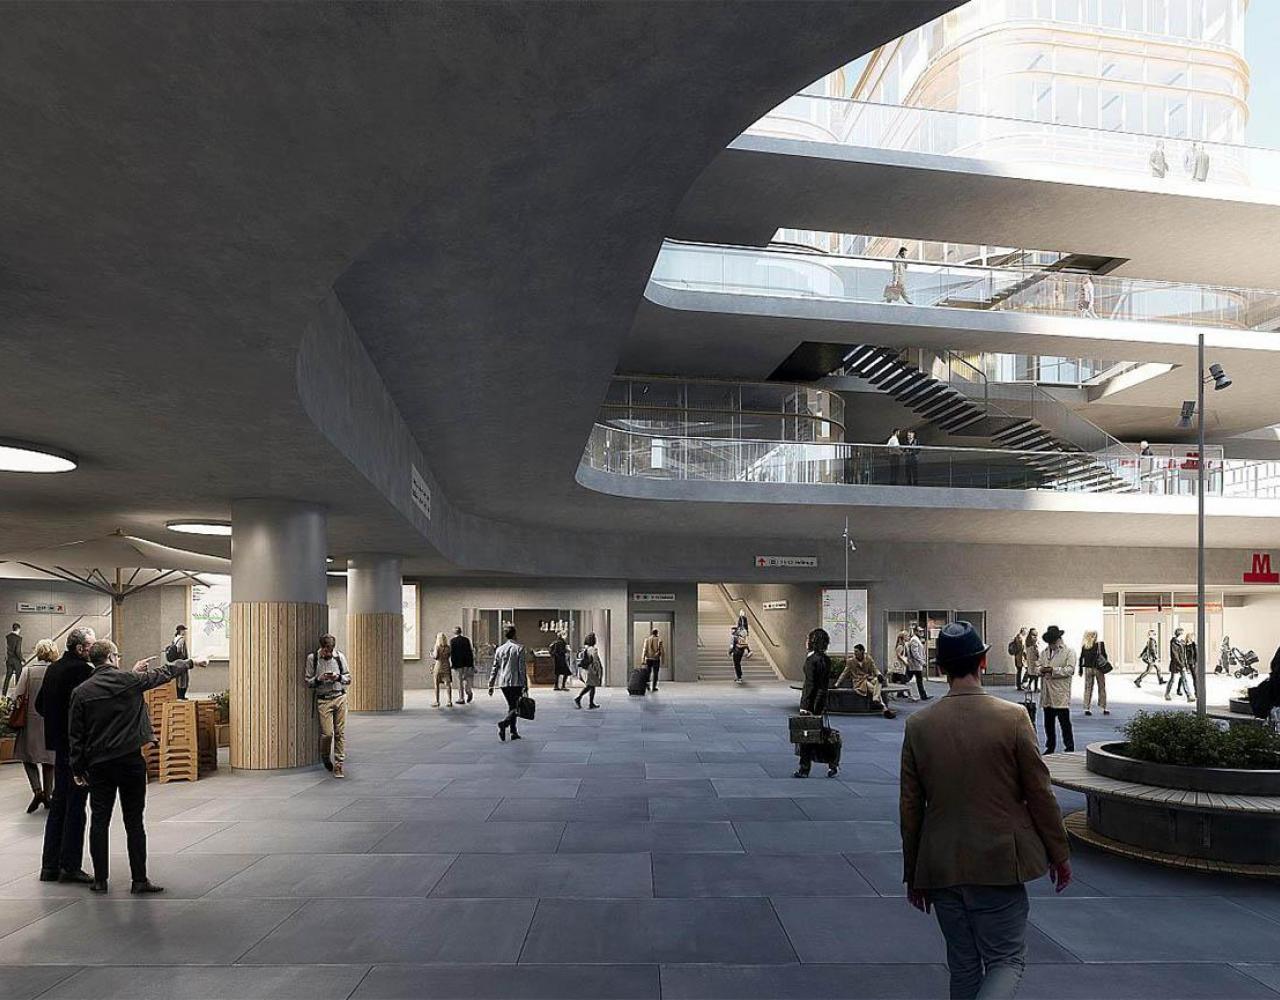 Ny Ellebjerg, Arkitema, infrastrukturplan, S-tog